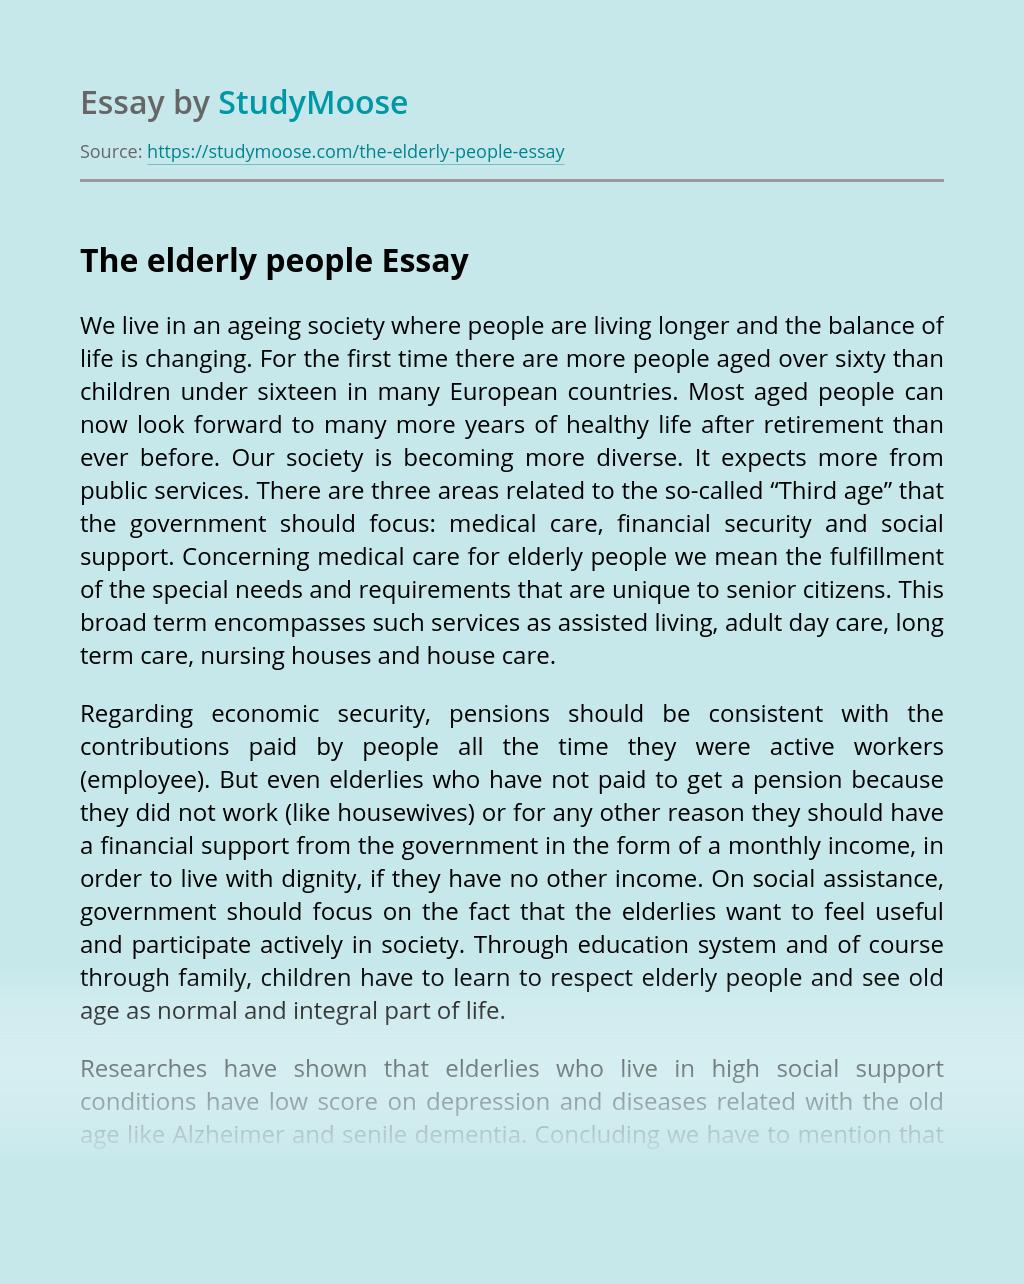 The elderly people